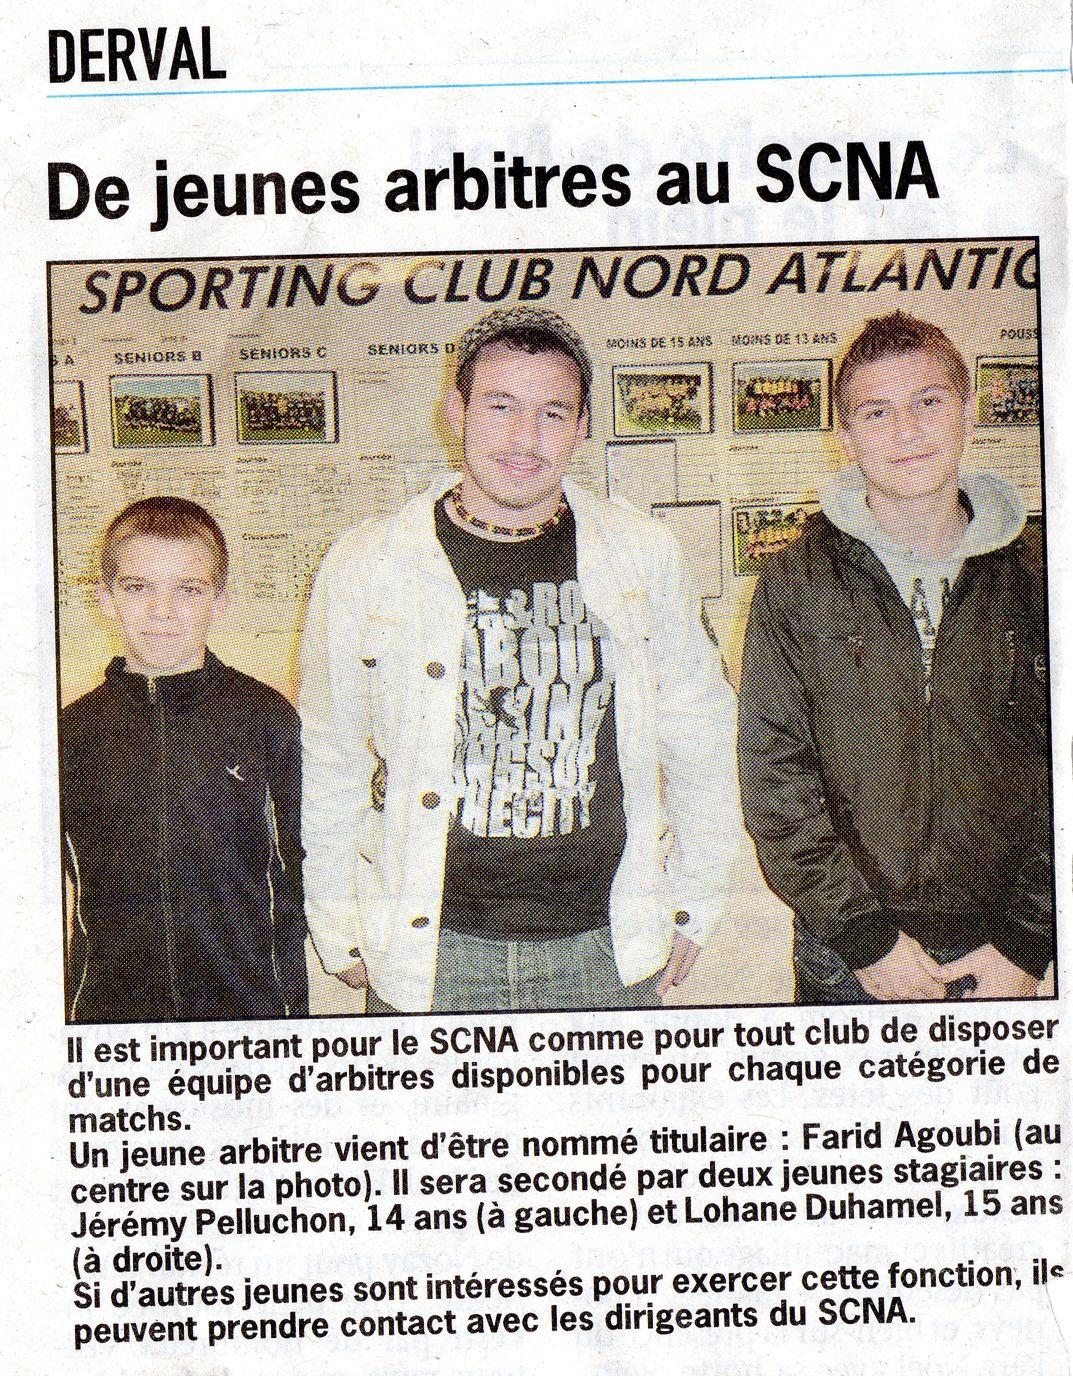 De jeunes arbitres au SCNA